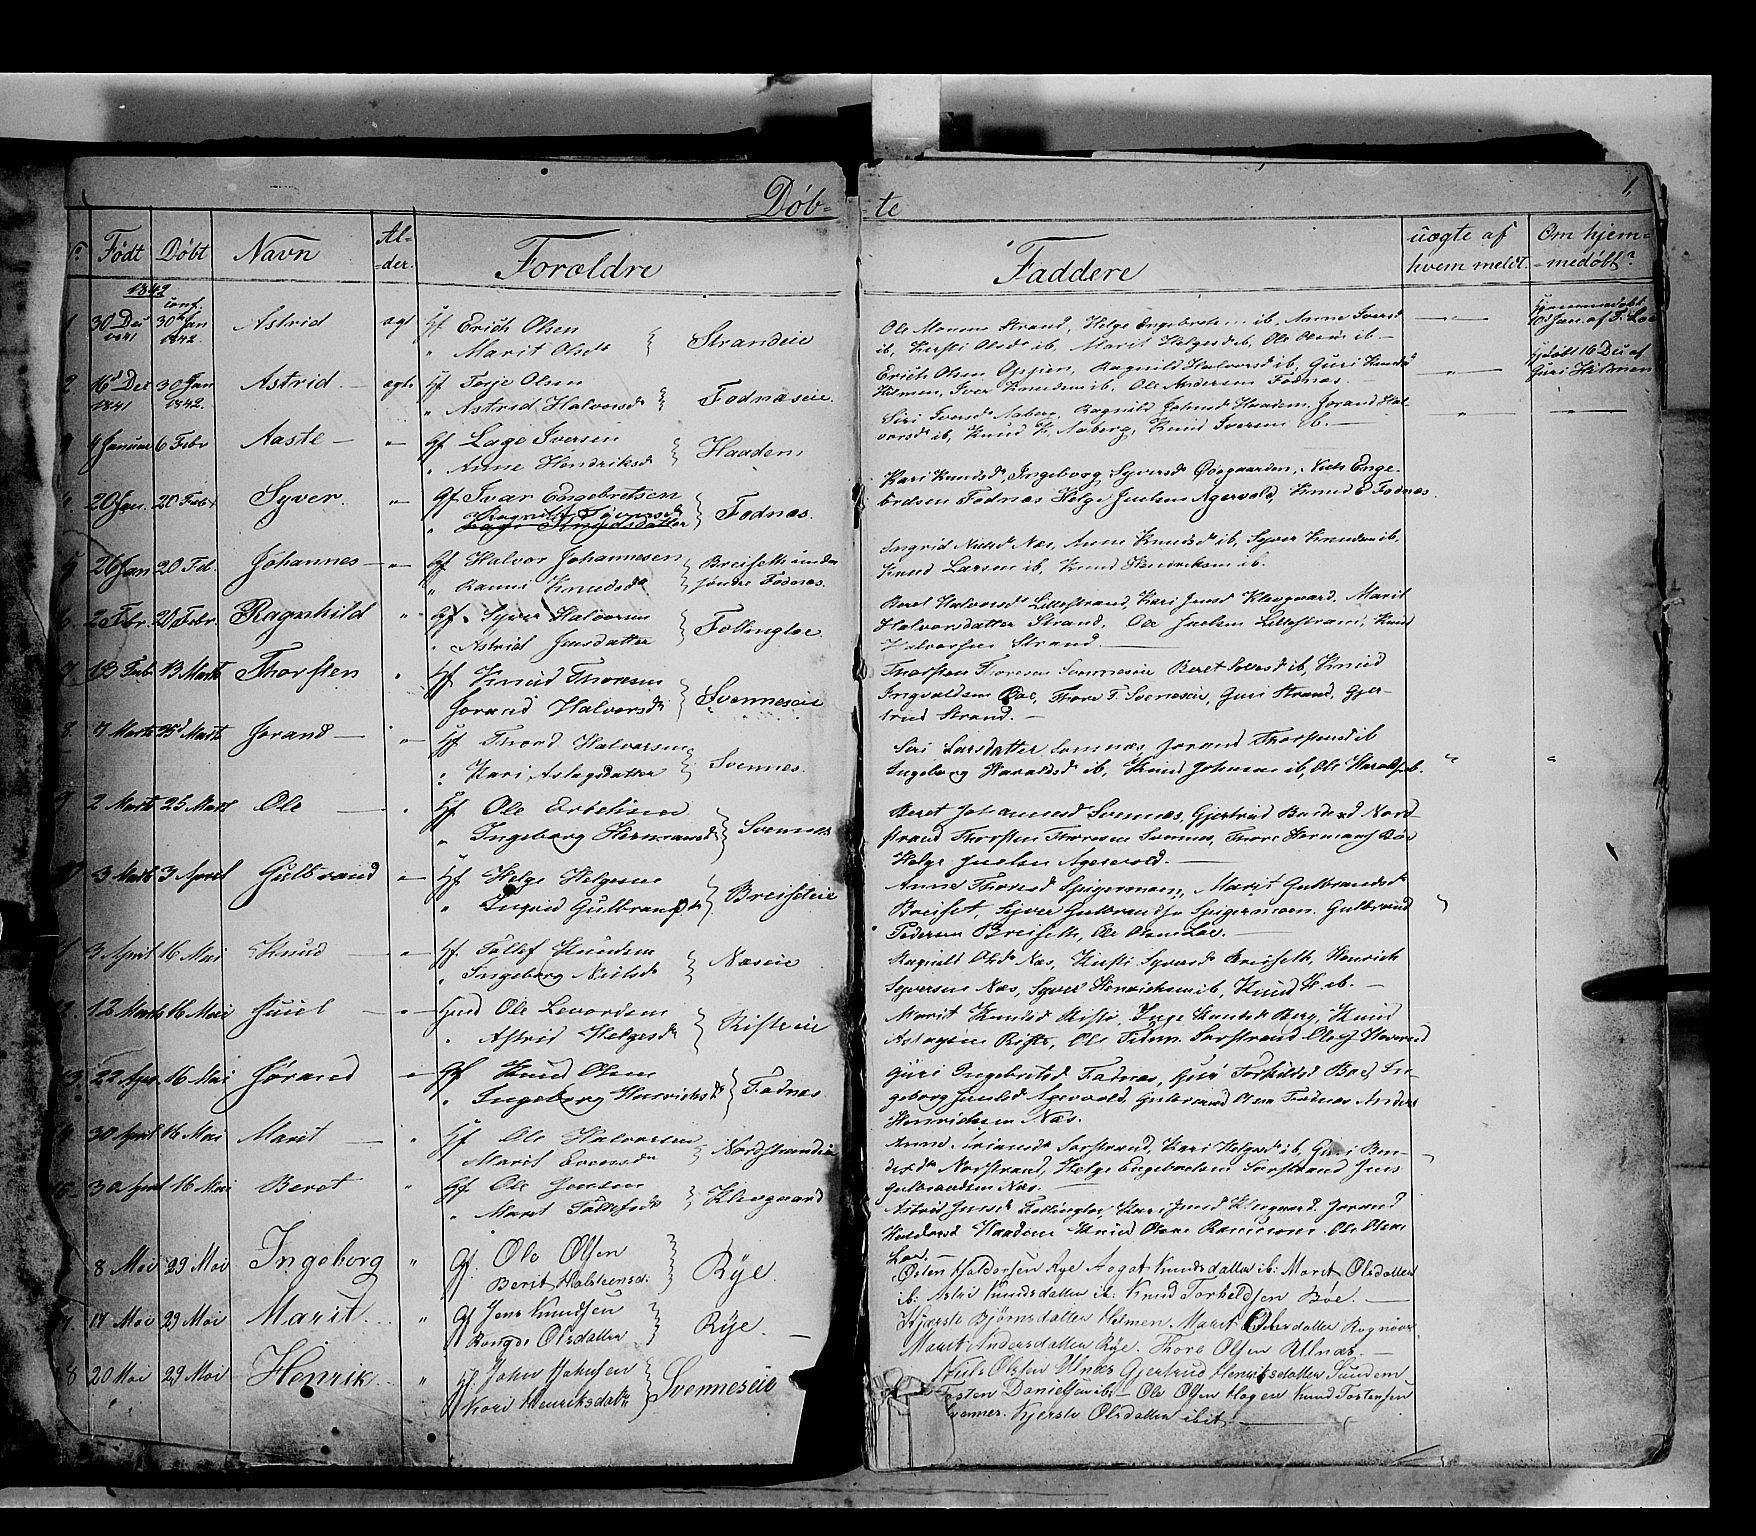 SAH, Nord-Aurdal prestekontor, Ministerialbok nr. 5, 1842-1863, s. 1